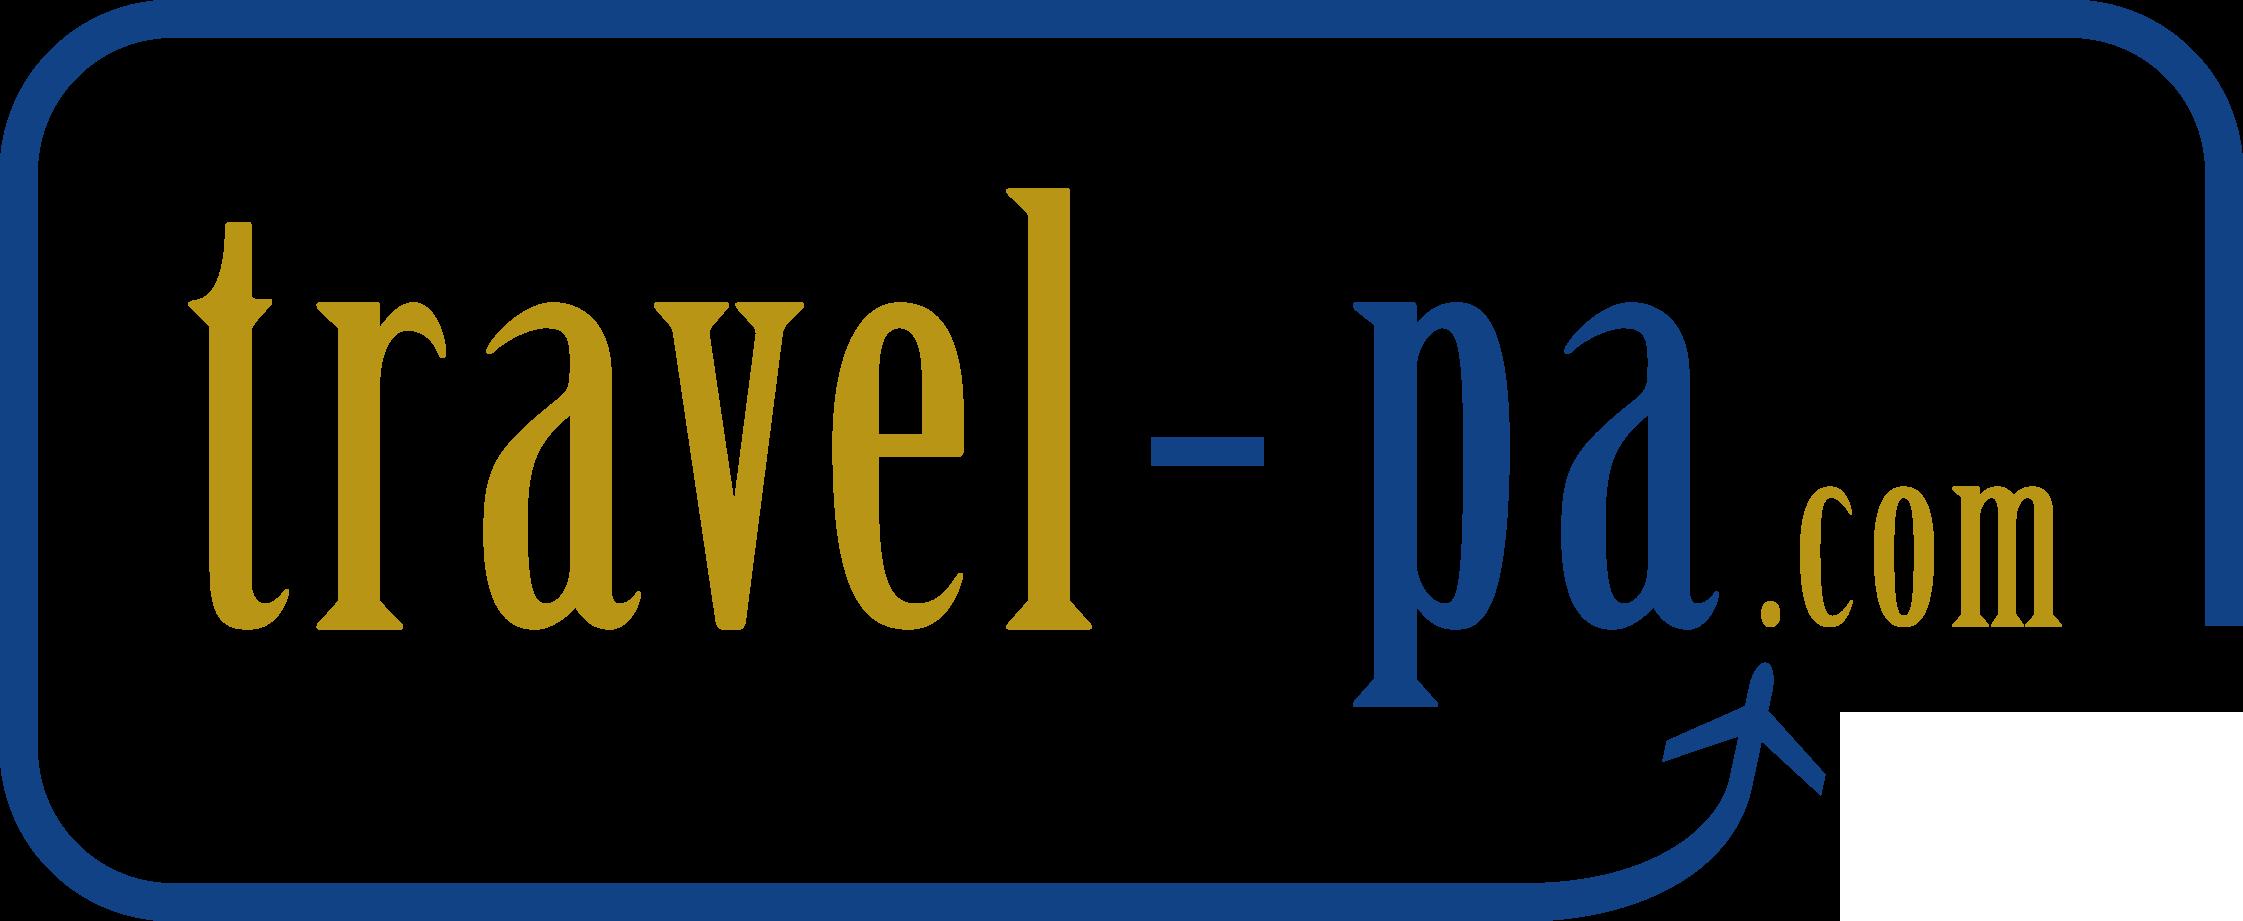 TRAVEL-PA Logo.png